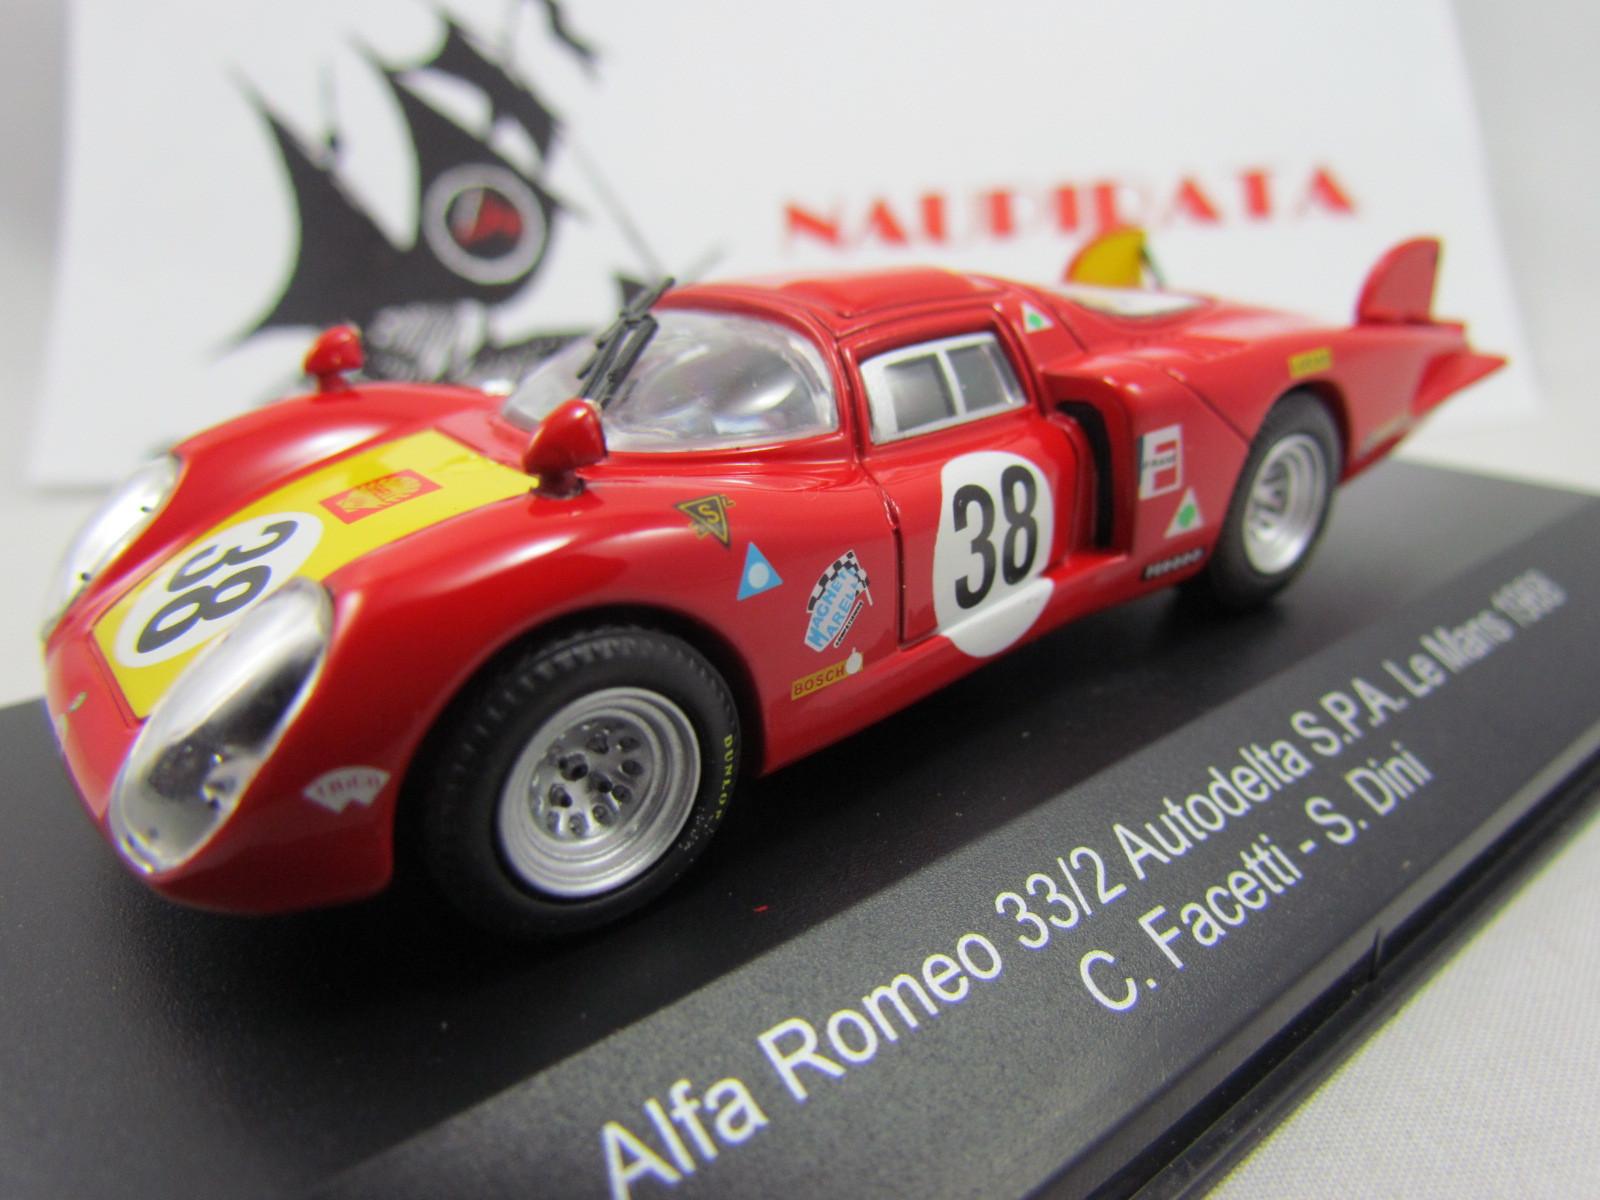 Alfa Romeo - 33/2 Autodelta S.P.A. Nº 38 Le Mans 1968 C. FACETTI - S. DINI - Top Model Collection - 1:43